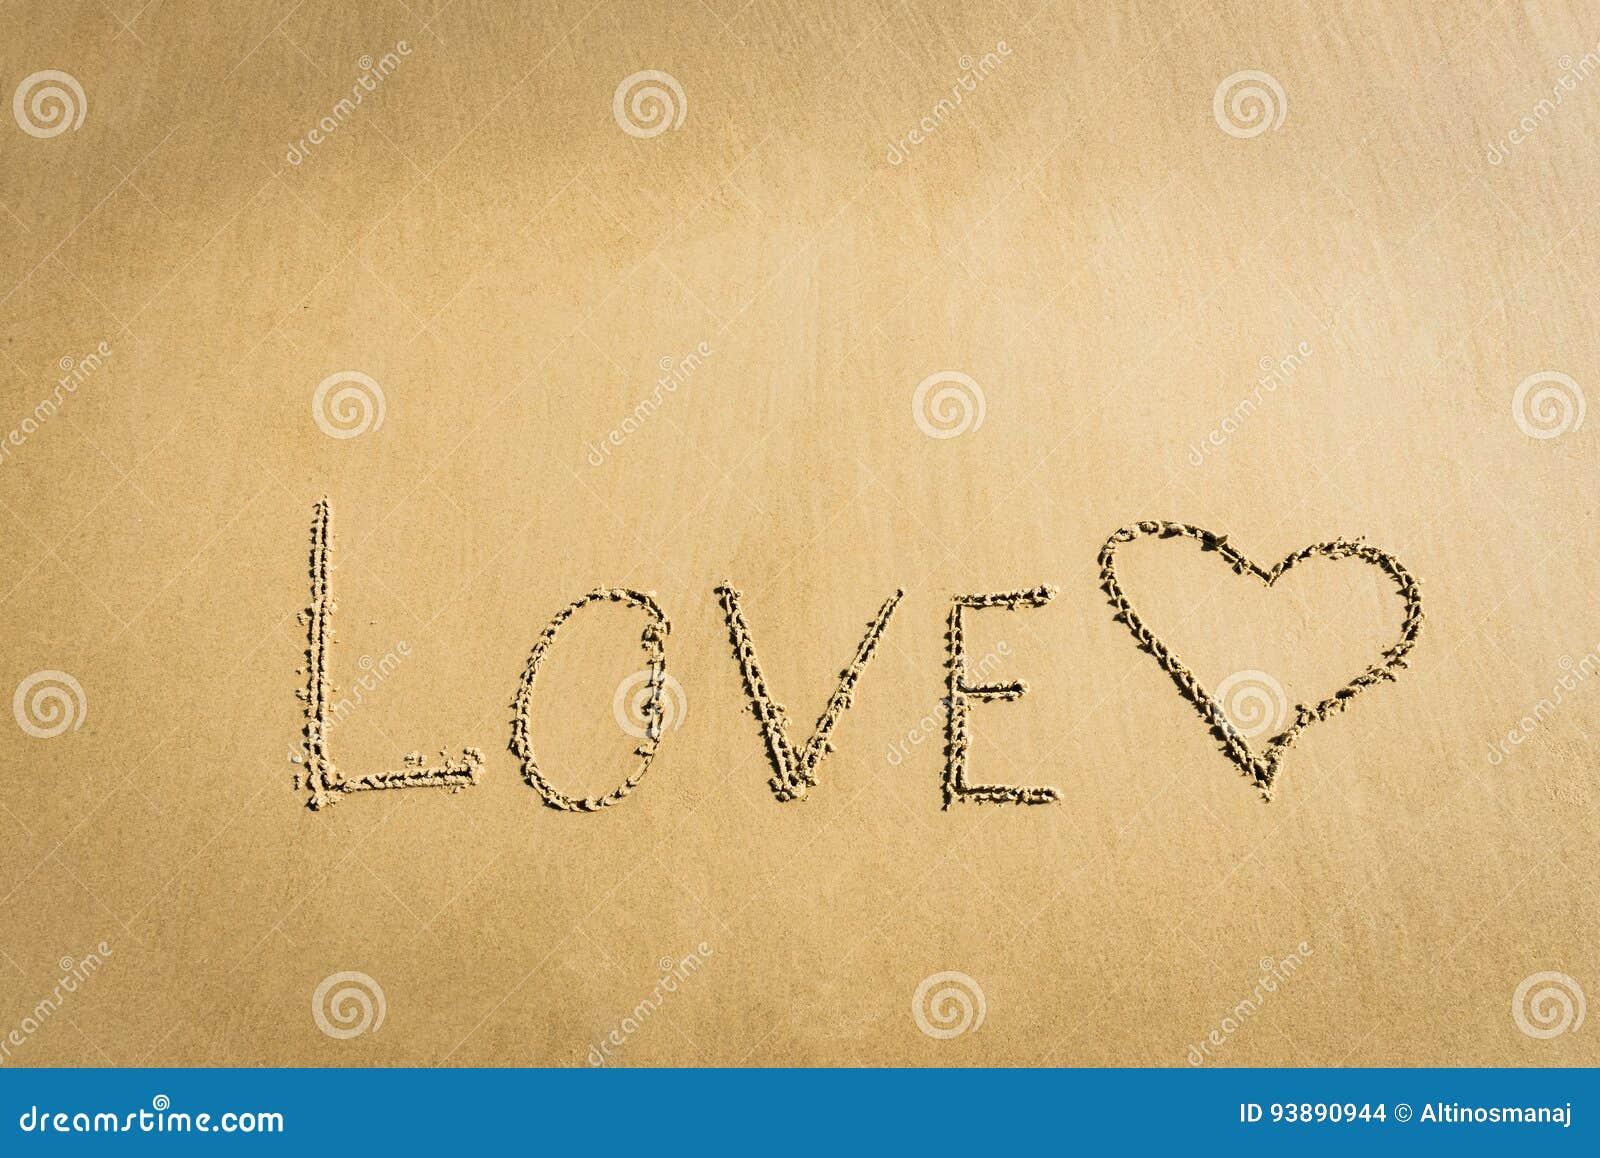 Word love written on the sand heart drawn message romantic symbol word love written on the sand heart drawn message romantic symbol concept biocorpaavc